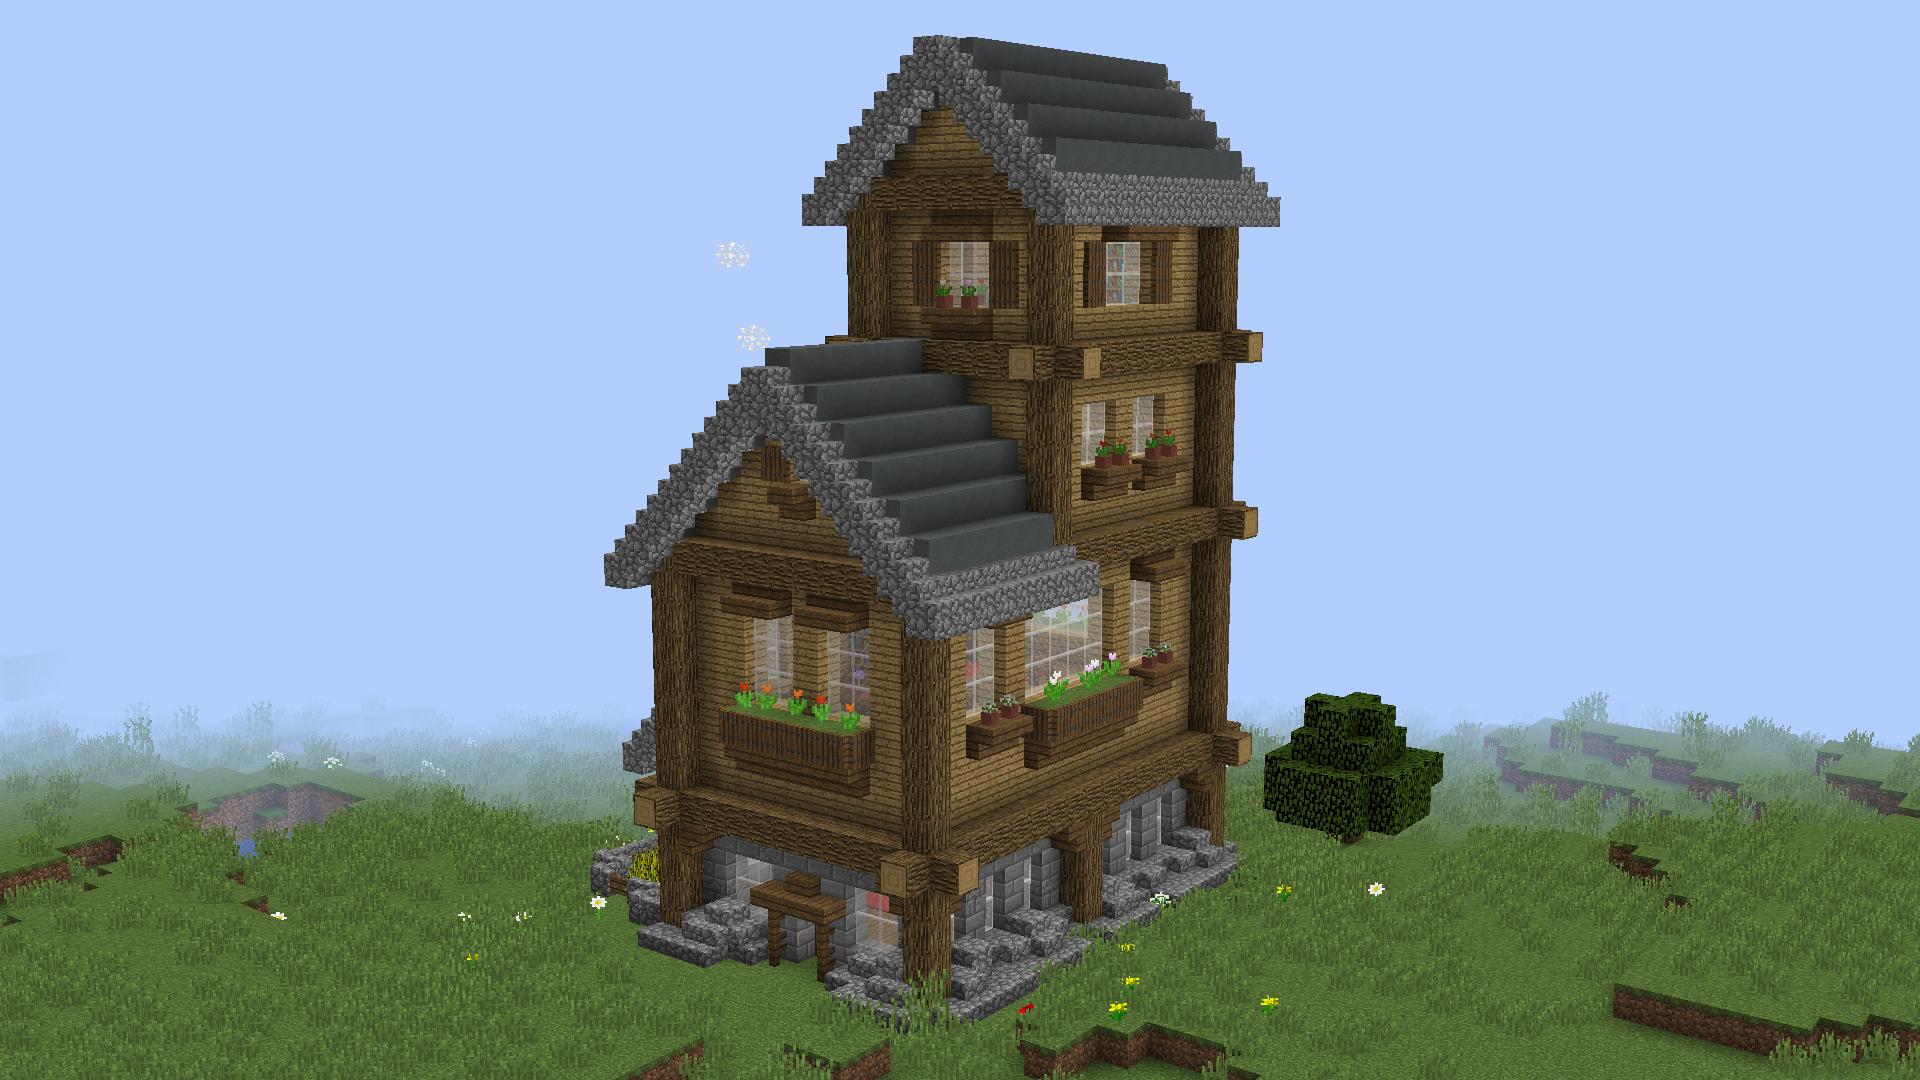 Baixar «Small Rustic House» (11 mb) mapa para Minecraft